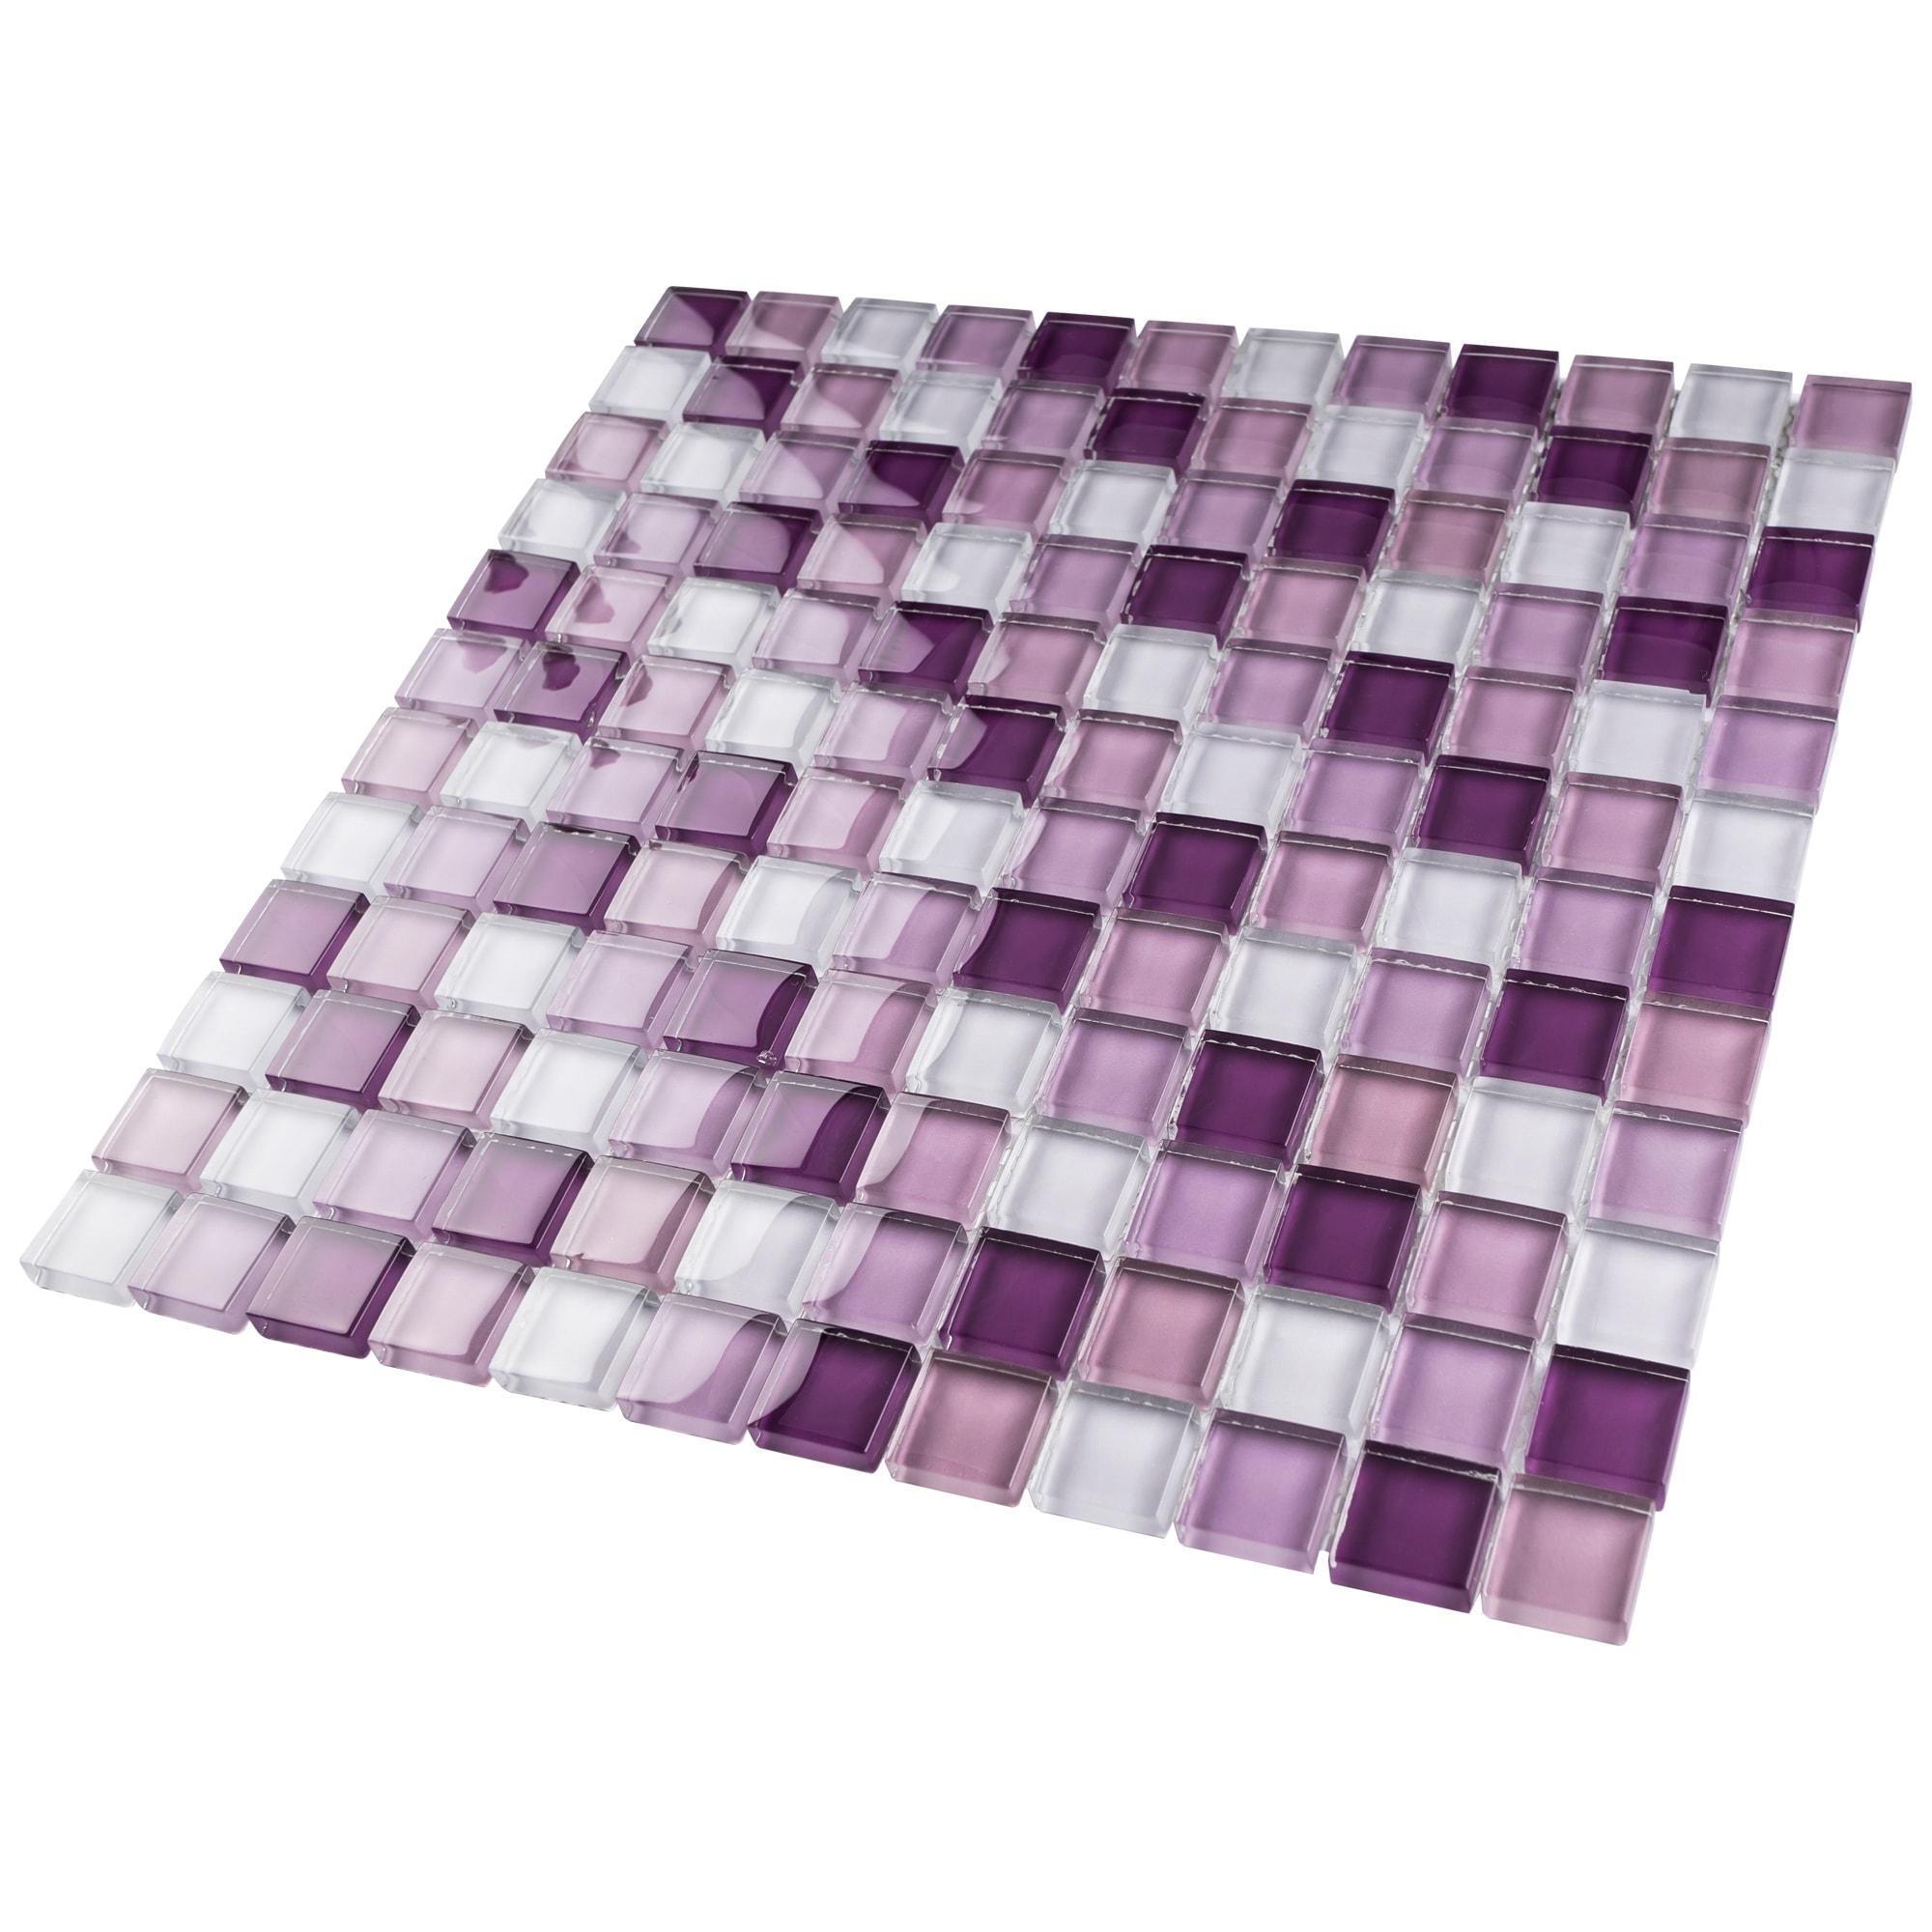 Tilegen Grid 1 X 1 Glass Mosaic Tile In Mix Purple Wall Tile 10 Sheets 9 6sqft Overstock 27973527